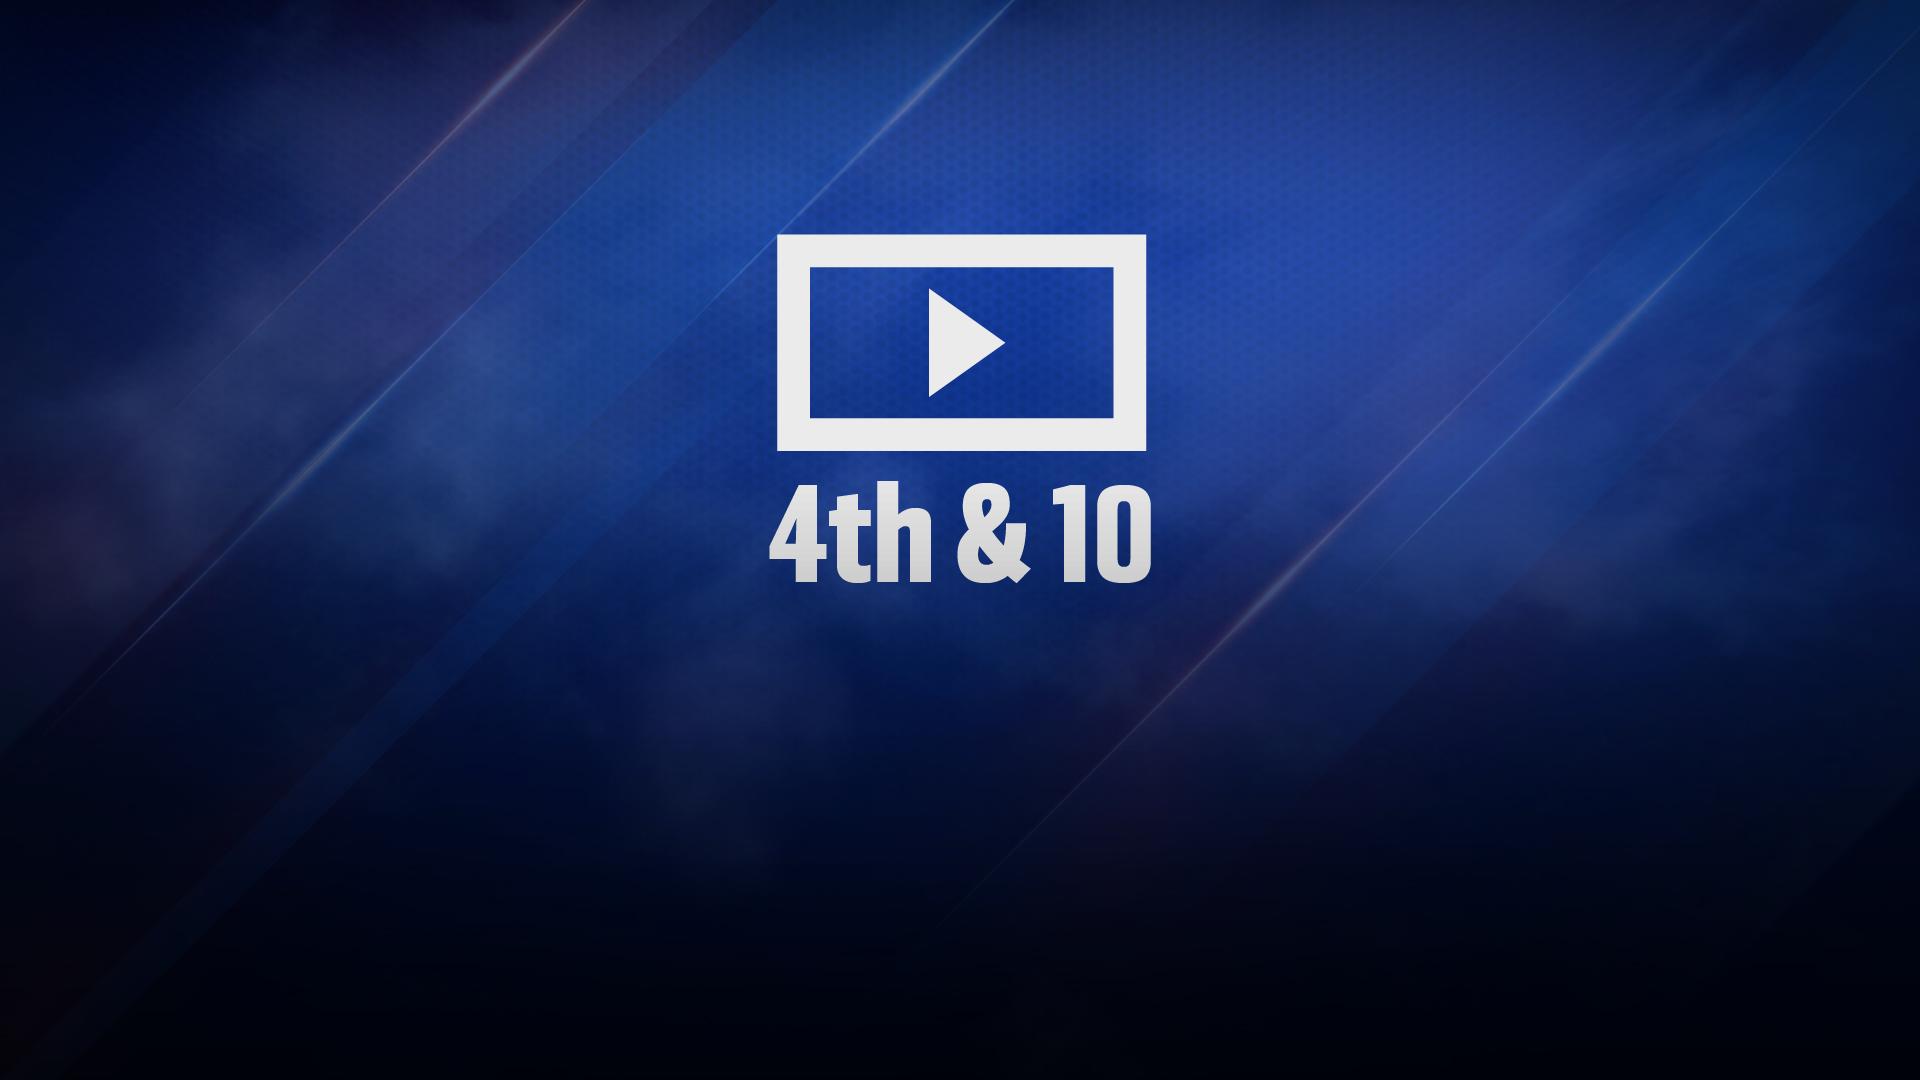 4th & 10